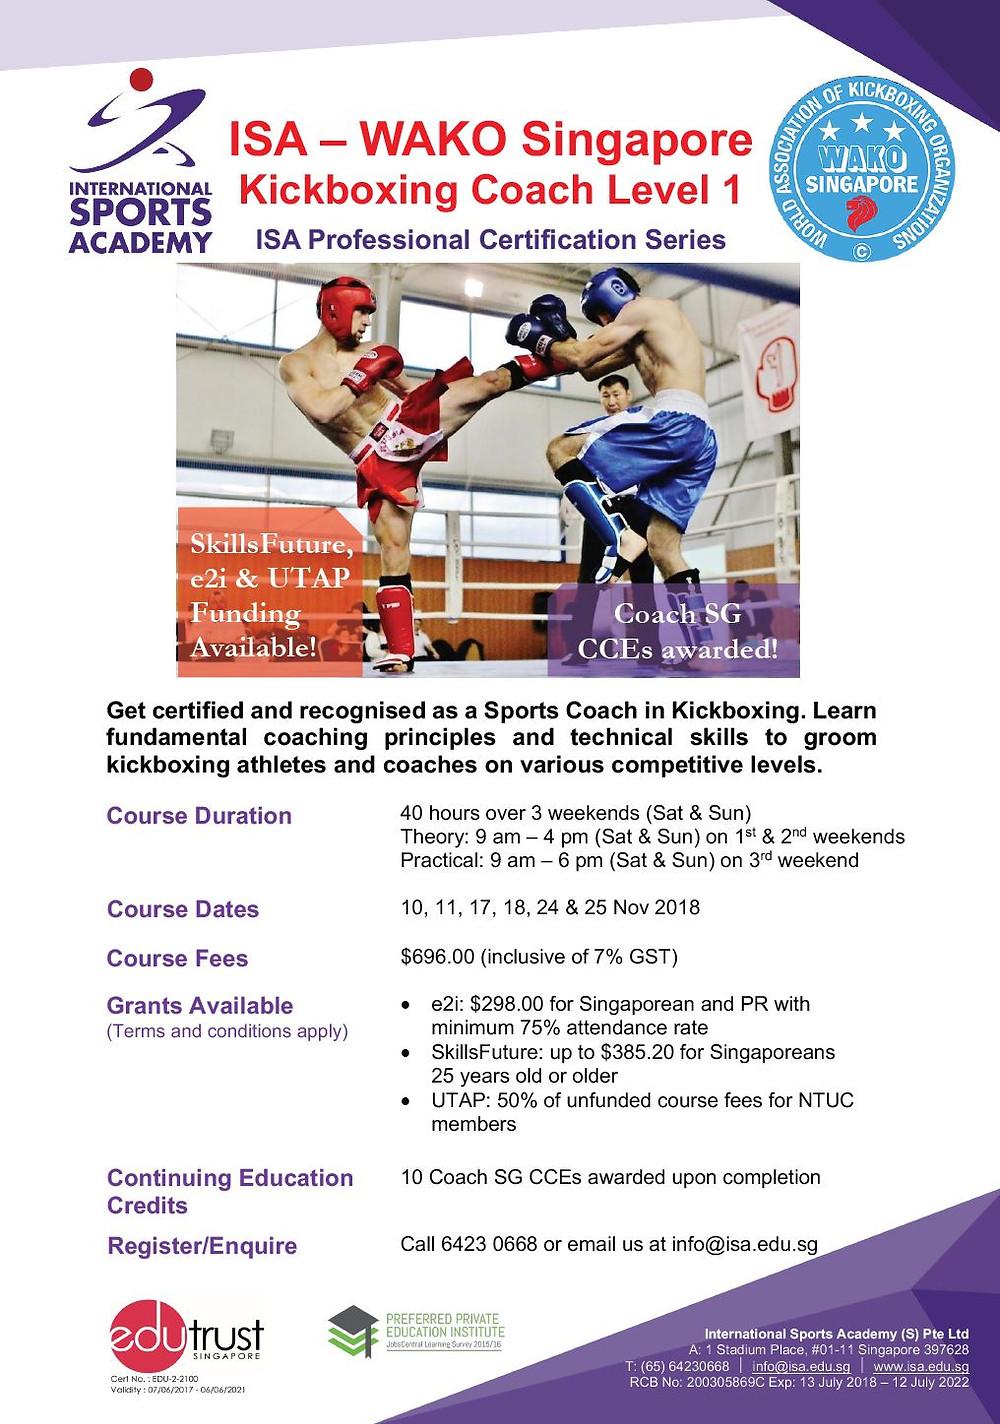 WAKO Singapore Kickboxing Coach Level 1